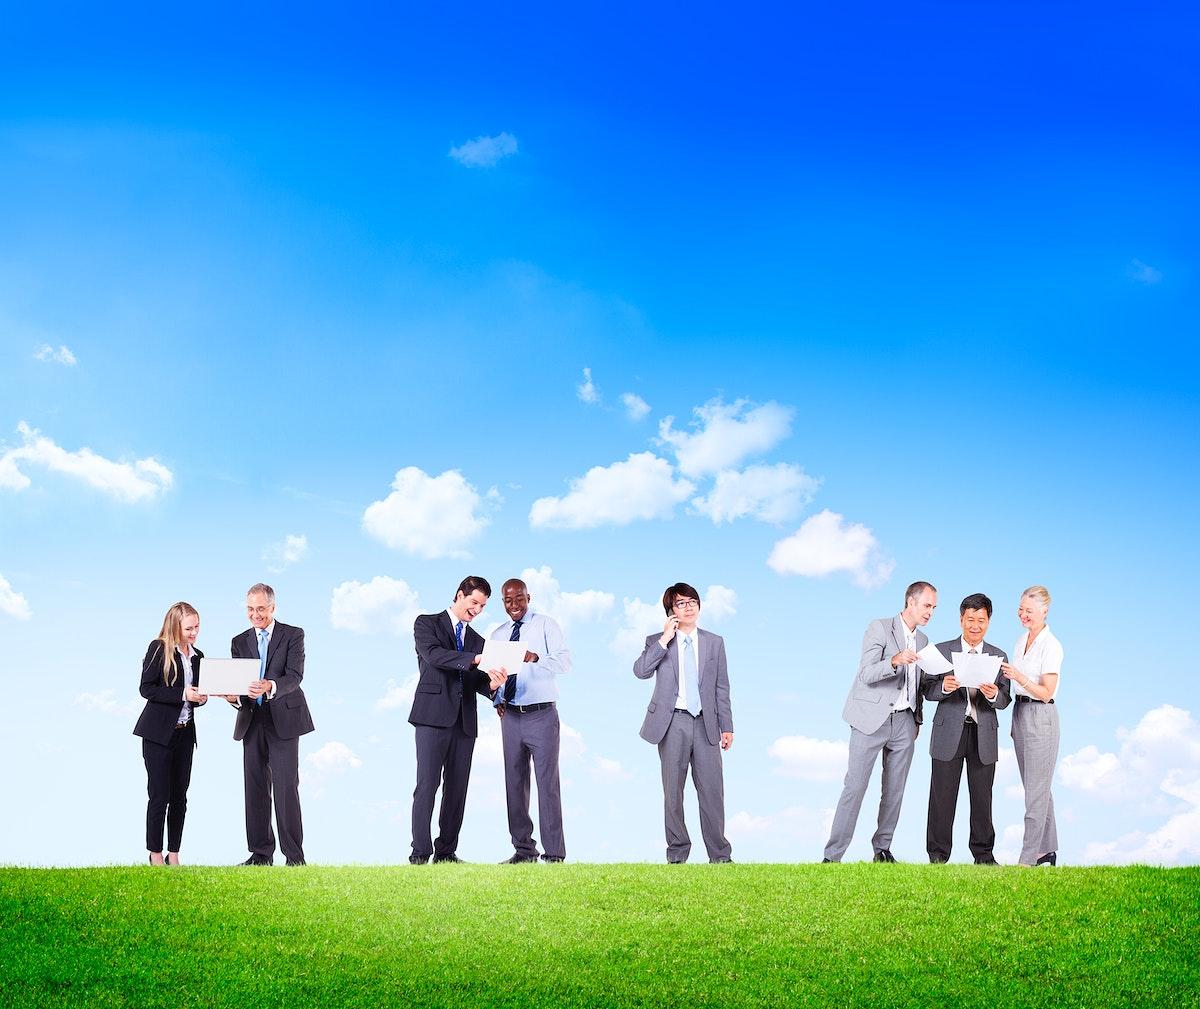 Collaboration Team Teamwork Partnership Occupation Professional Leadership Concept